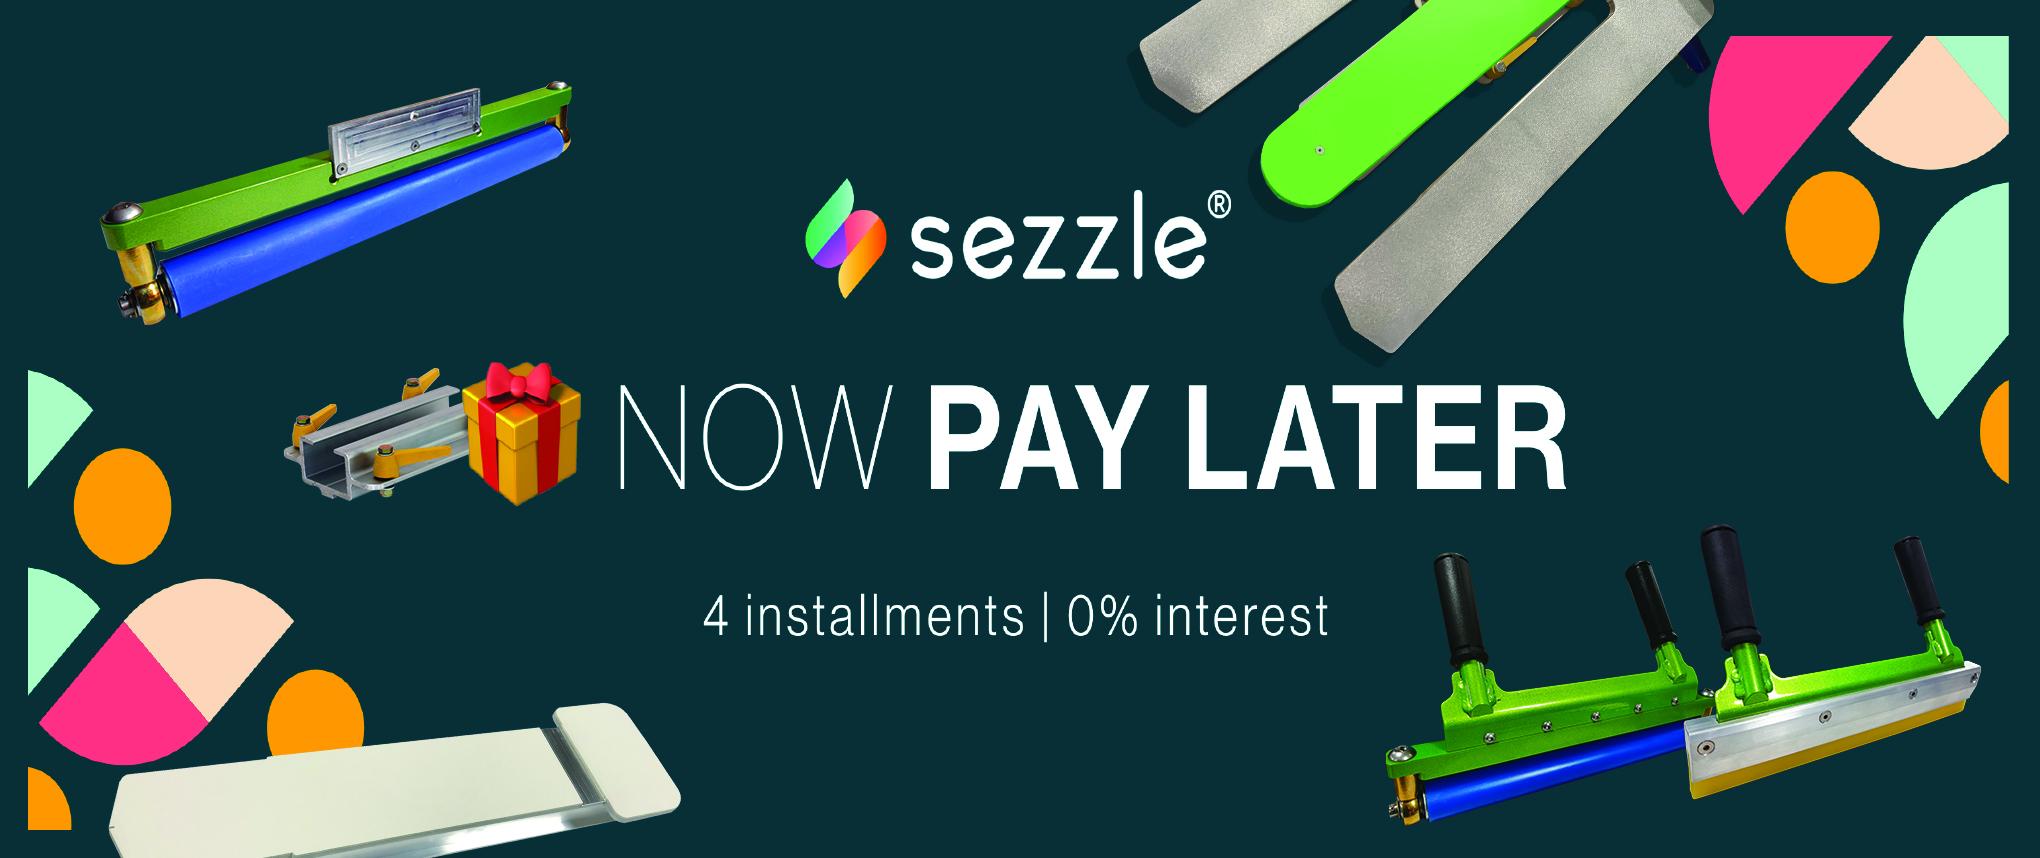 sezzle-web-banner.jpg